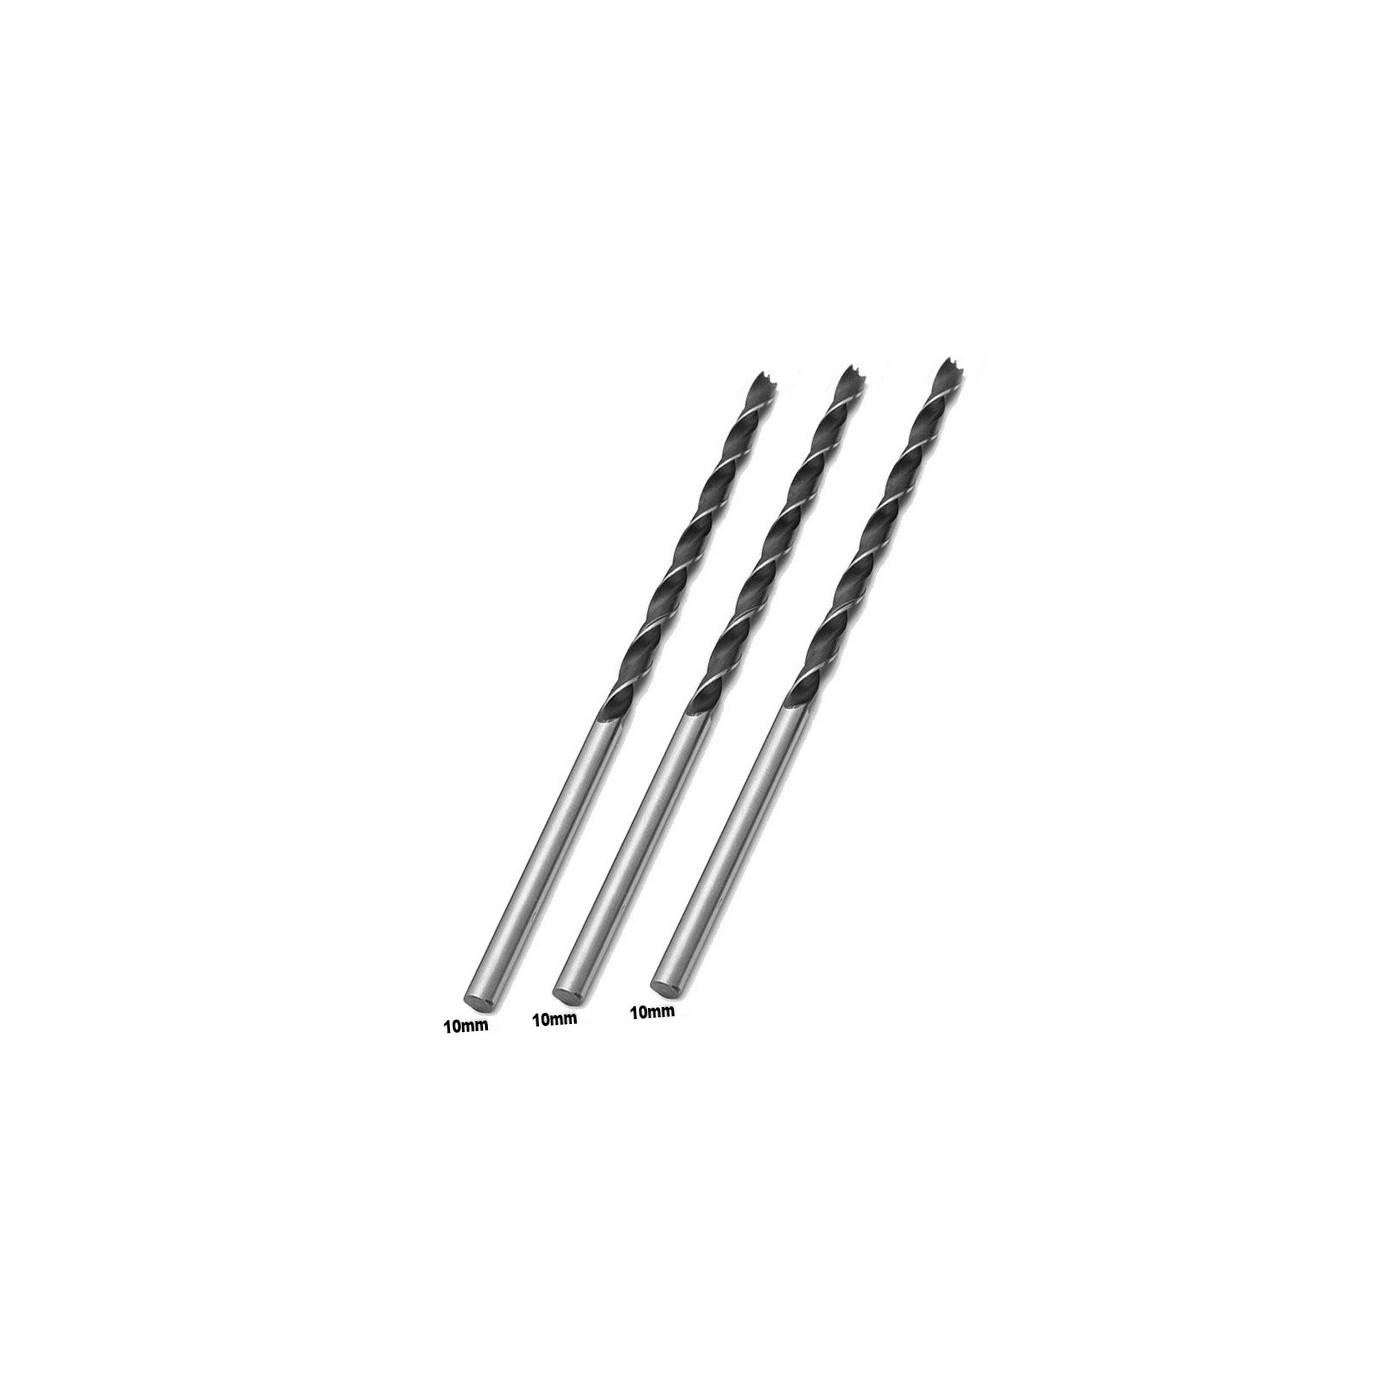 Set of 3 extra long wood drill bits (10x300 mm)  - 1